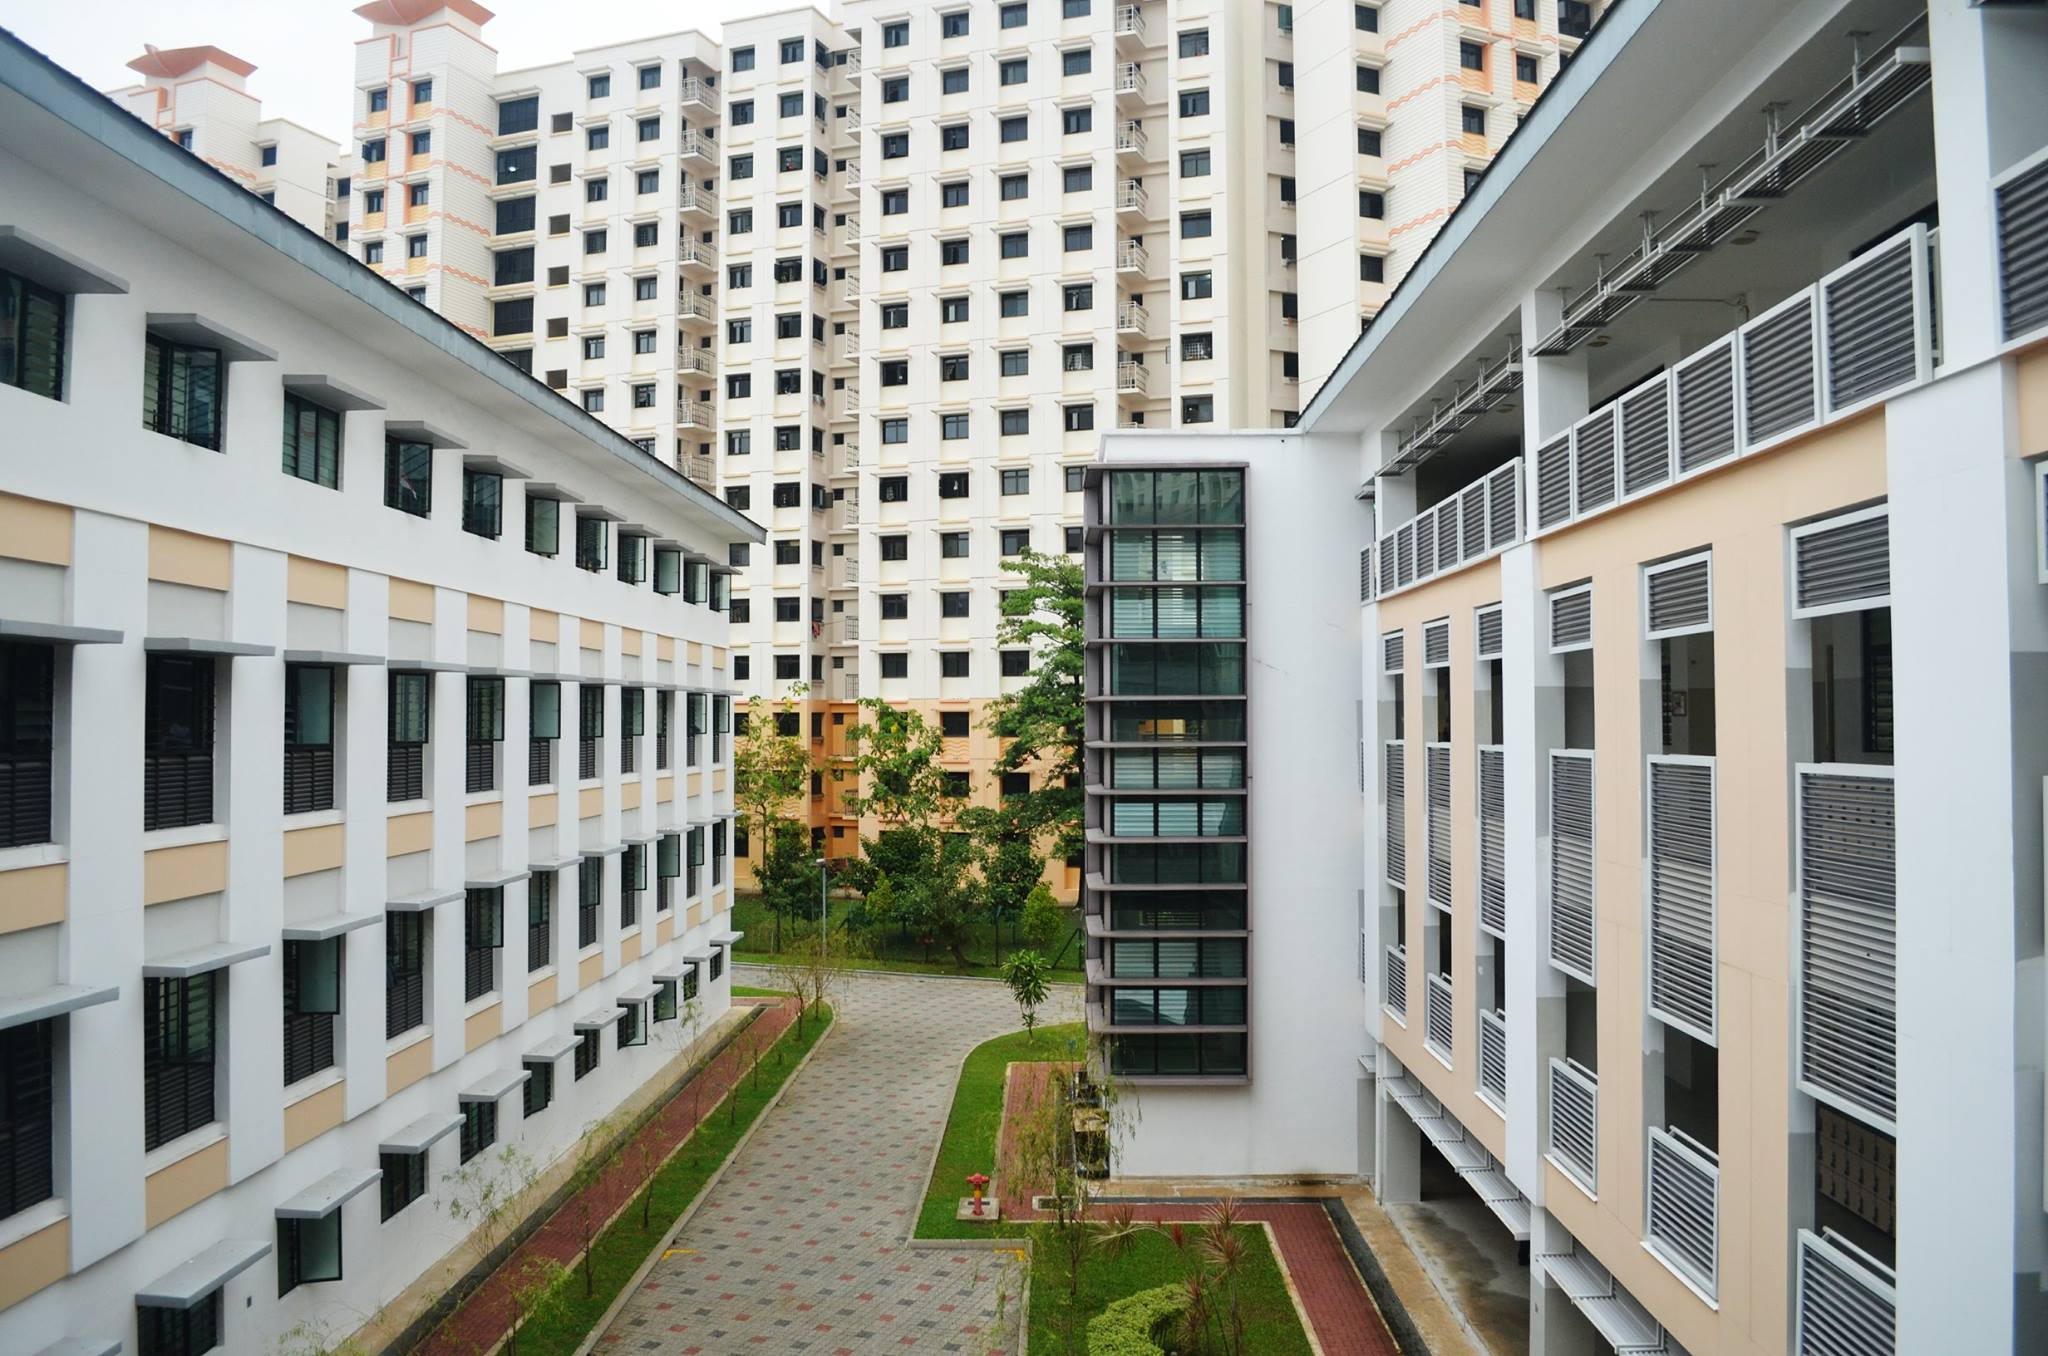 file nan chiau high classroom blocks jpg file nan chiau high classroom blocks jpg